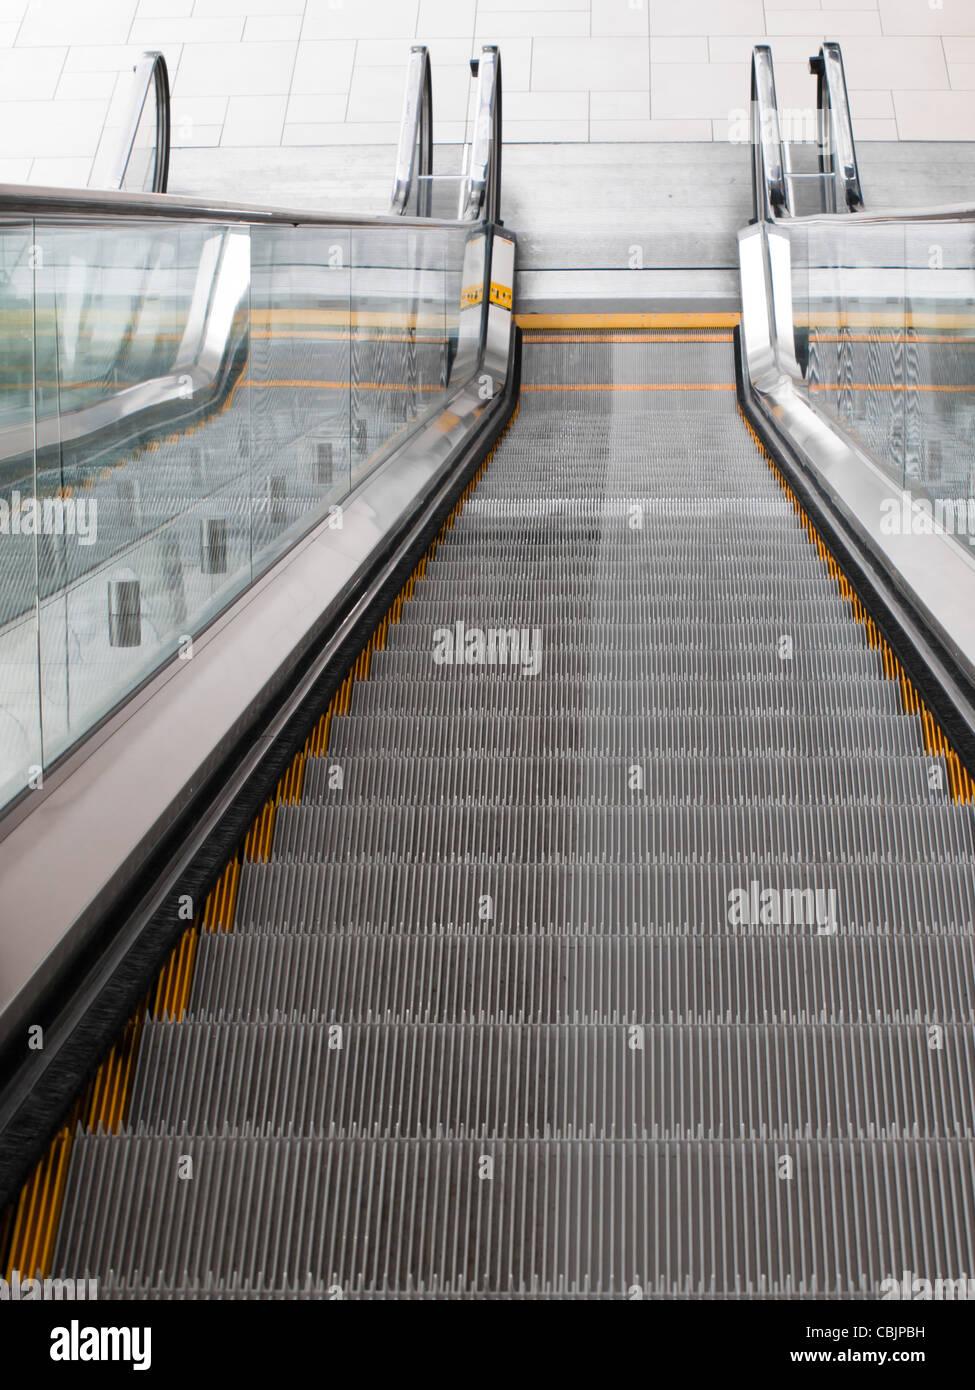 Escalator at the Colorado Convention Center in Downtown Denver. - Stock Image